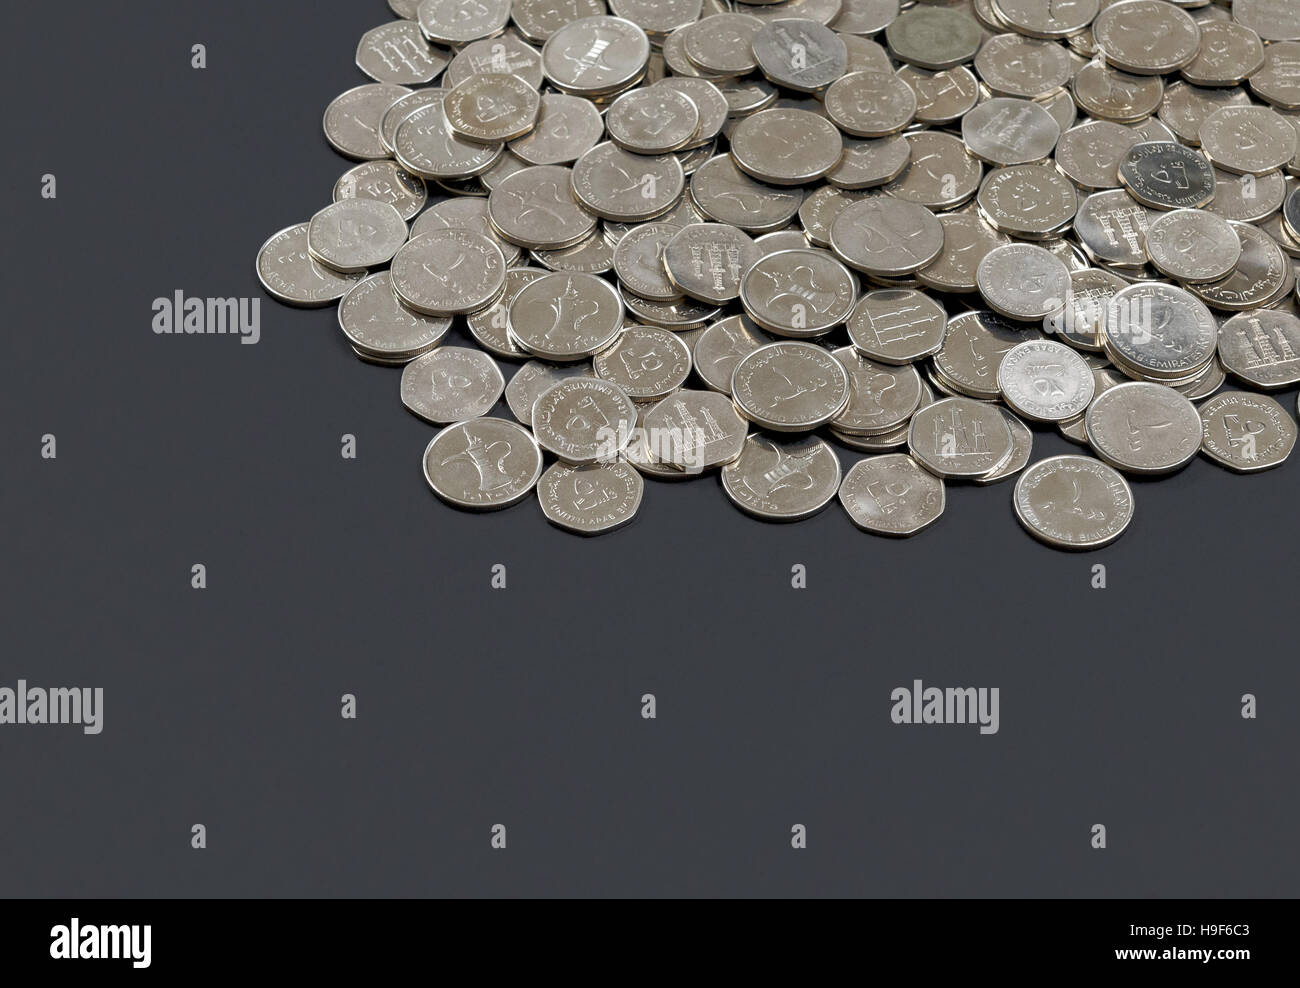 Dubai currency stock photos dubai currency stock images alamy pile of uae dirham coins on dark background stock image biocorpaavc